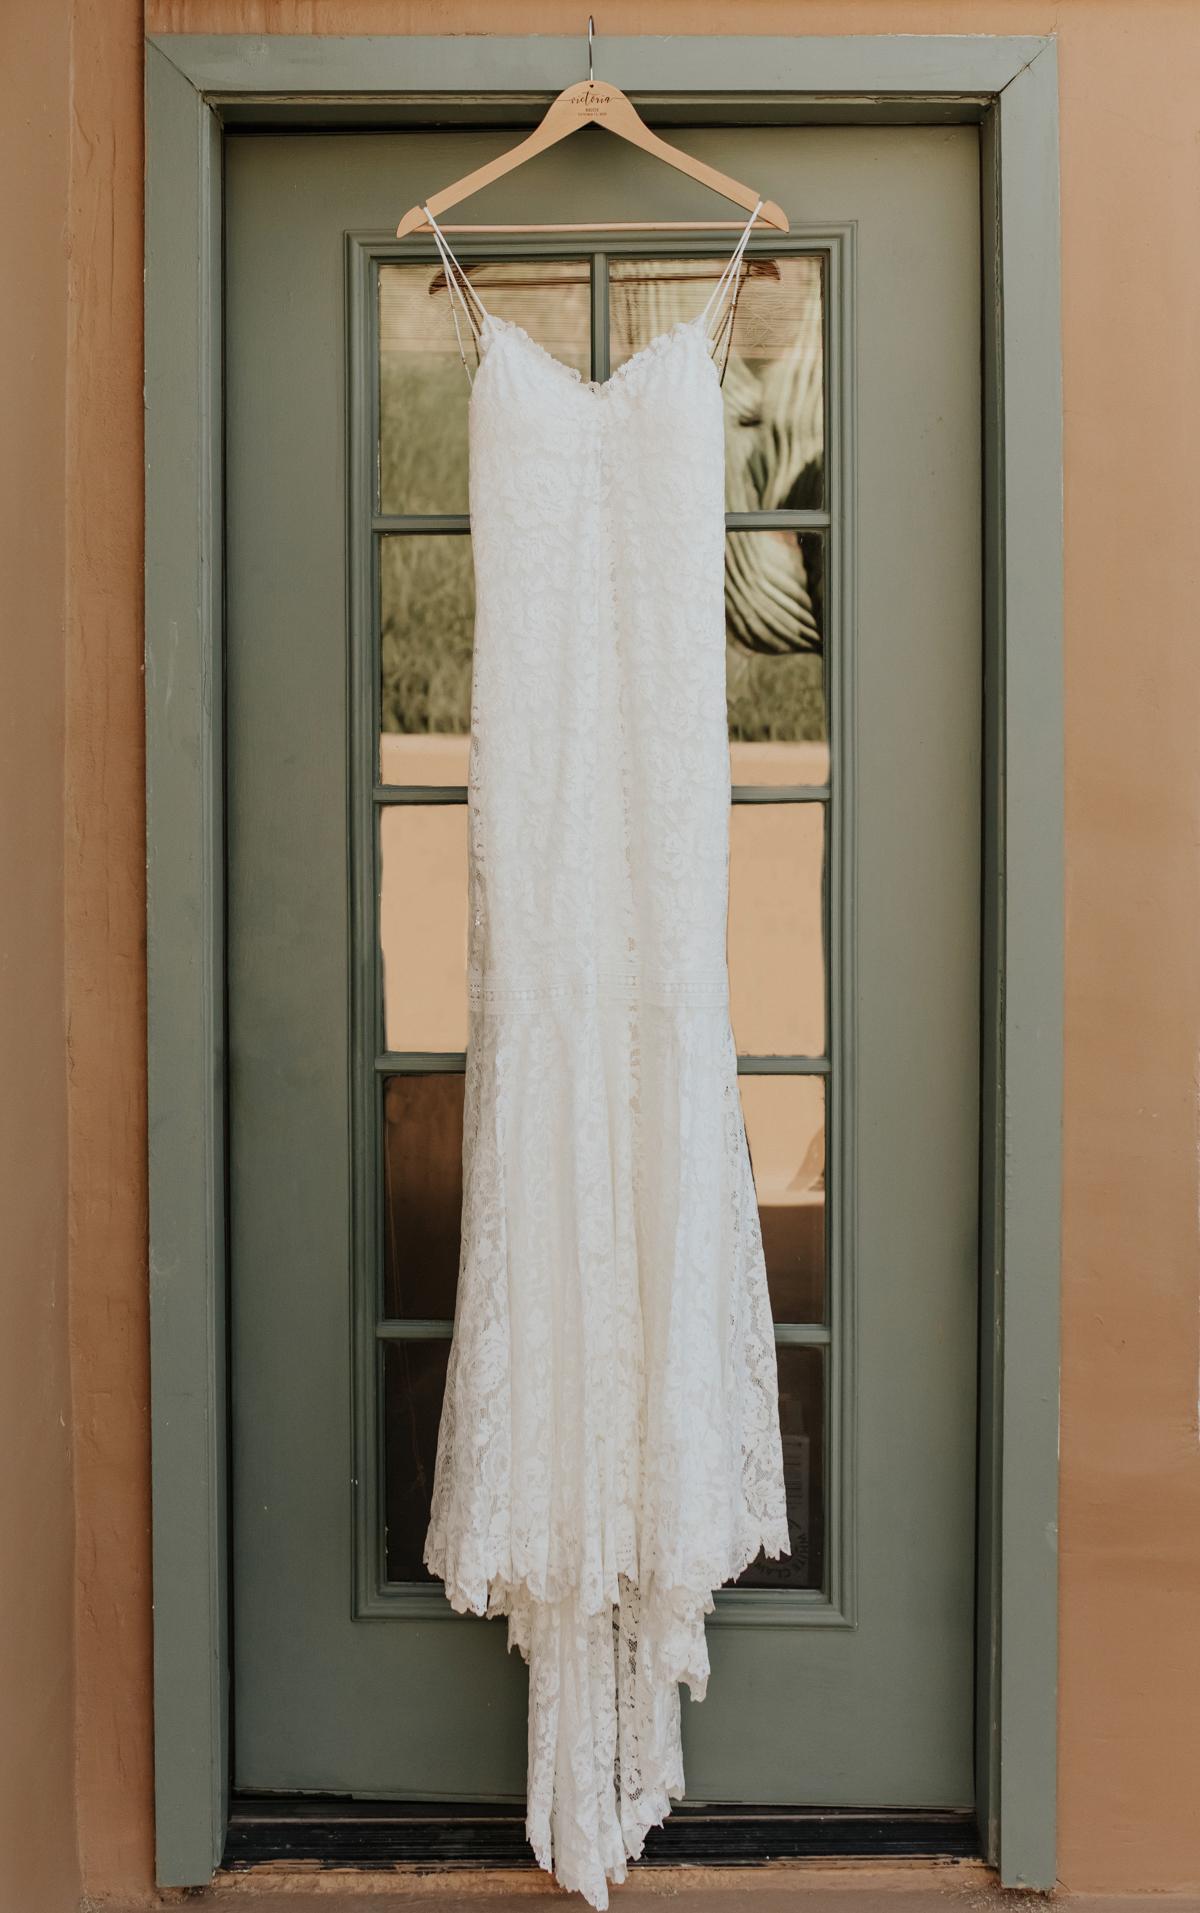 Megan Claire Photography | Boho Desert Wedding details at Superstition Mountains